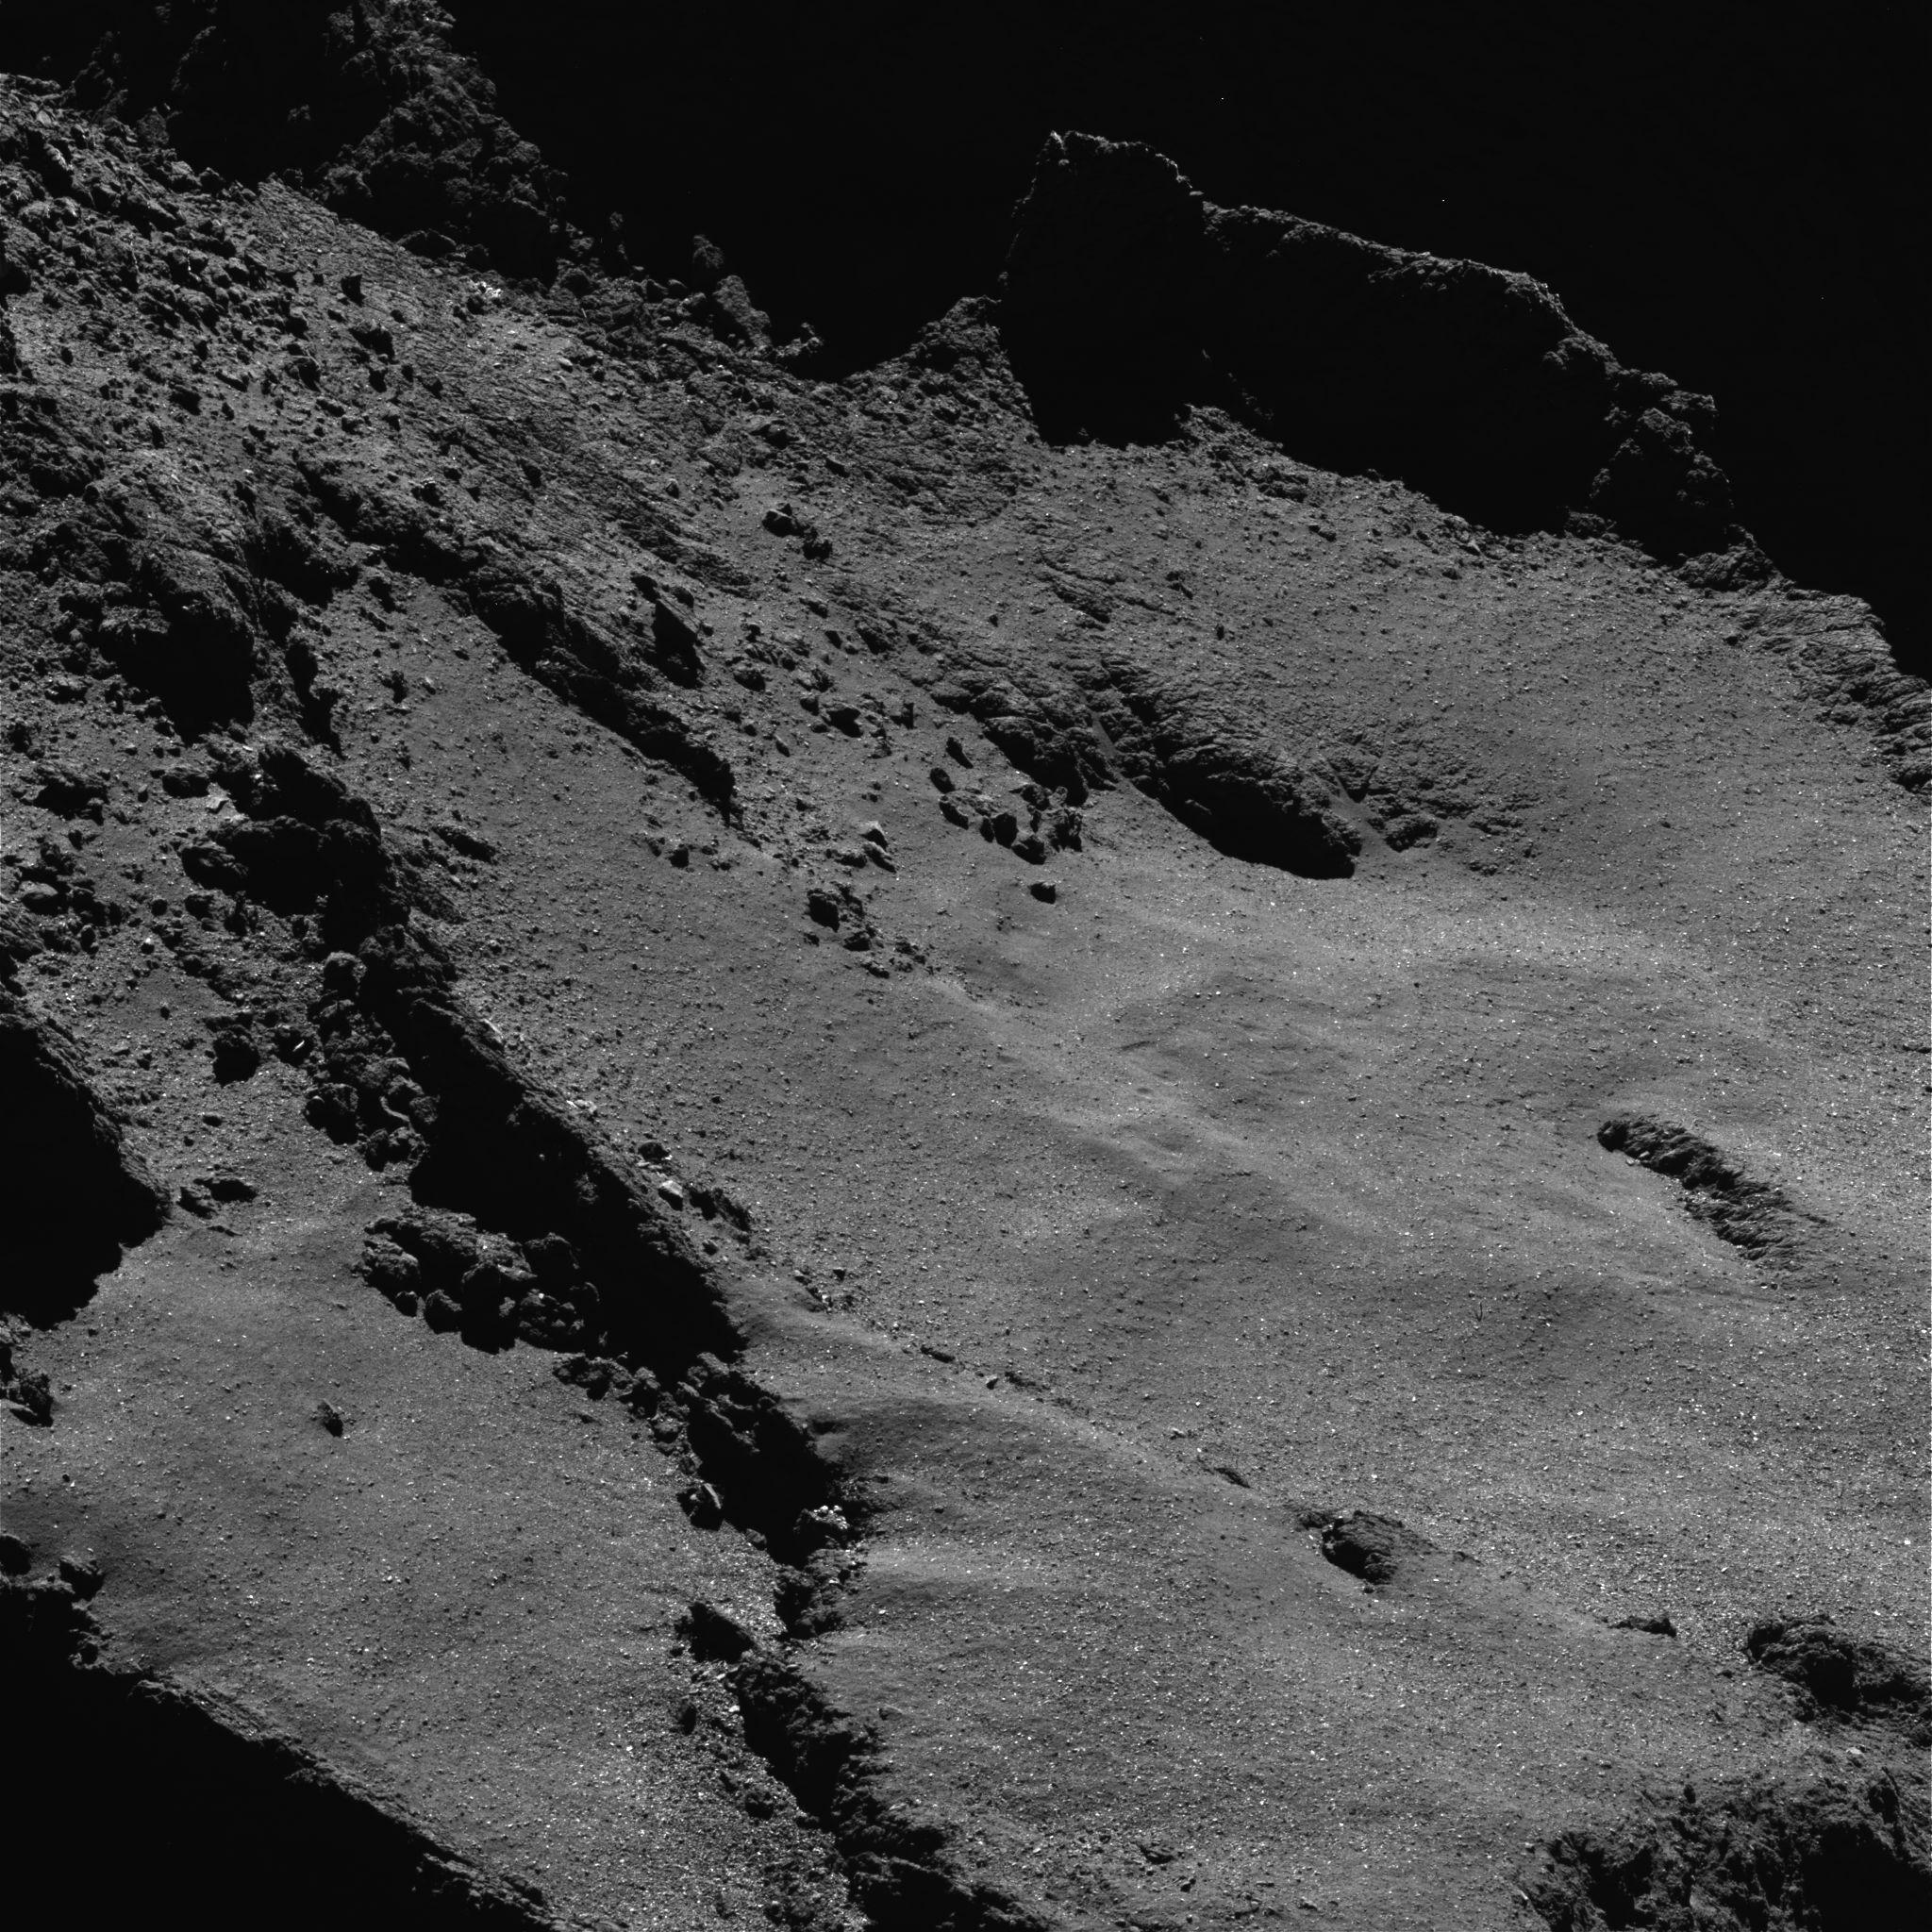 Rosetta safe mode 5 km from comet – Rosetta – ESA's comet ...